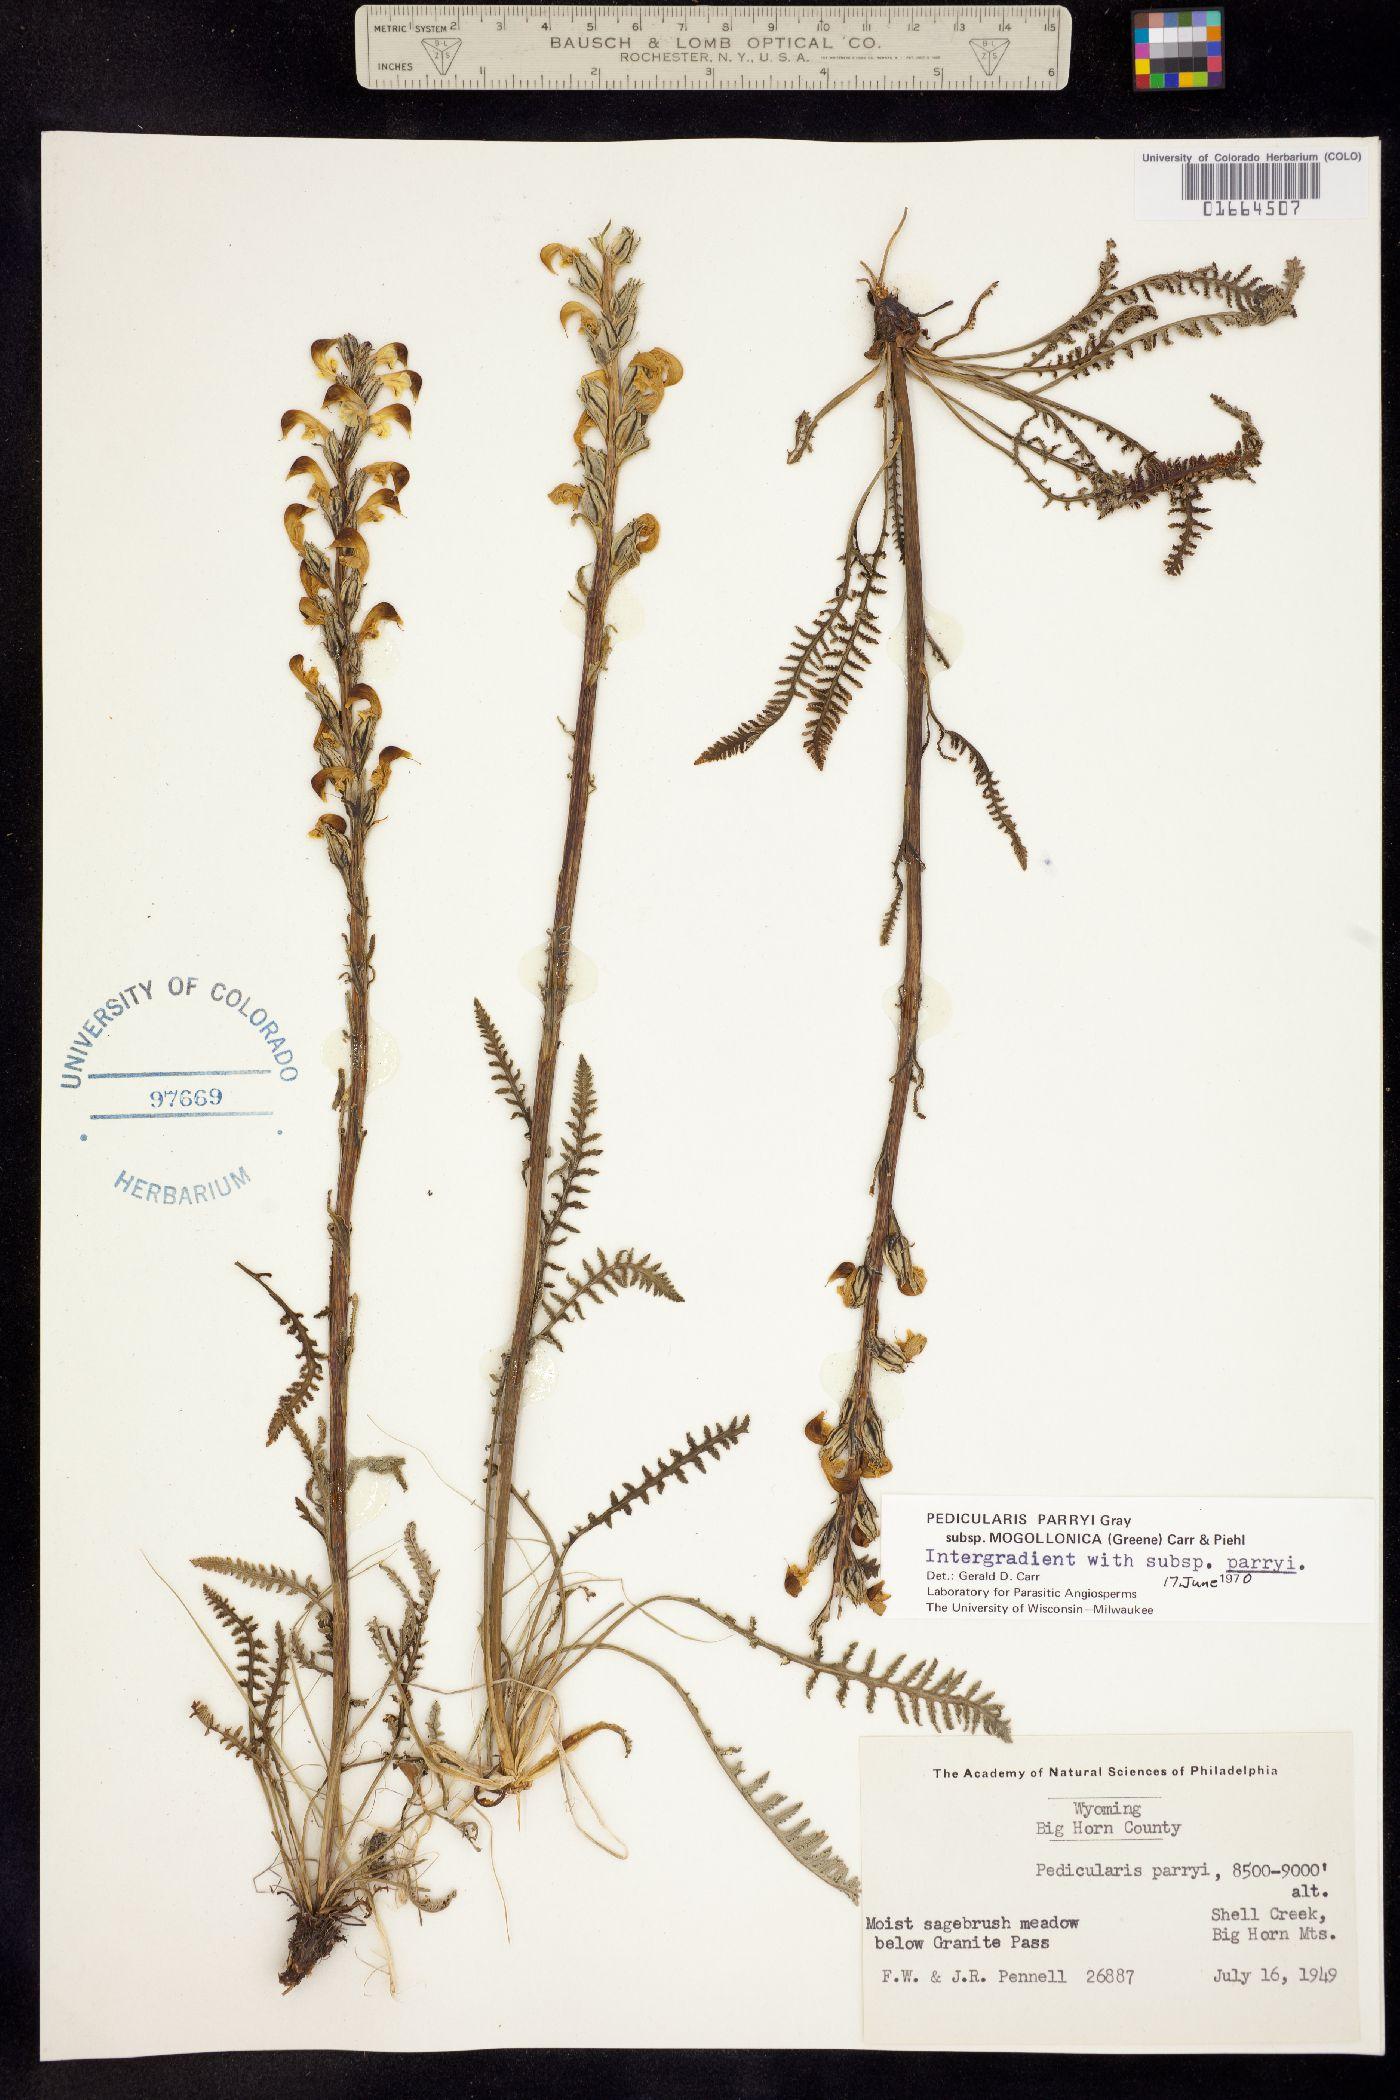 Pedicularis parryi ssp. mogollonica image